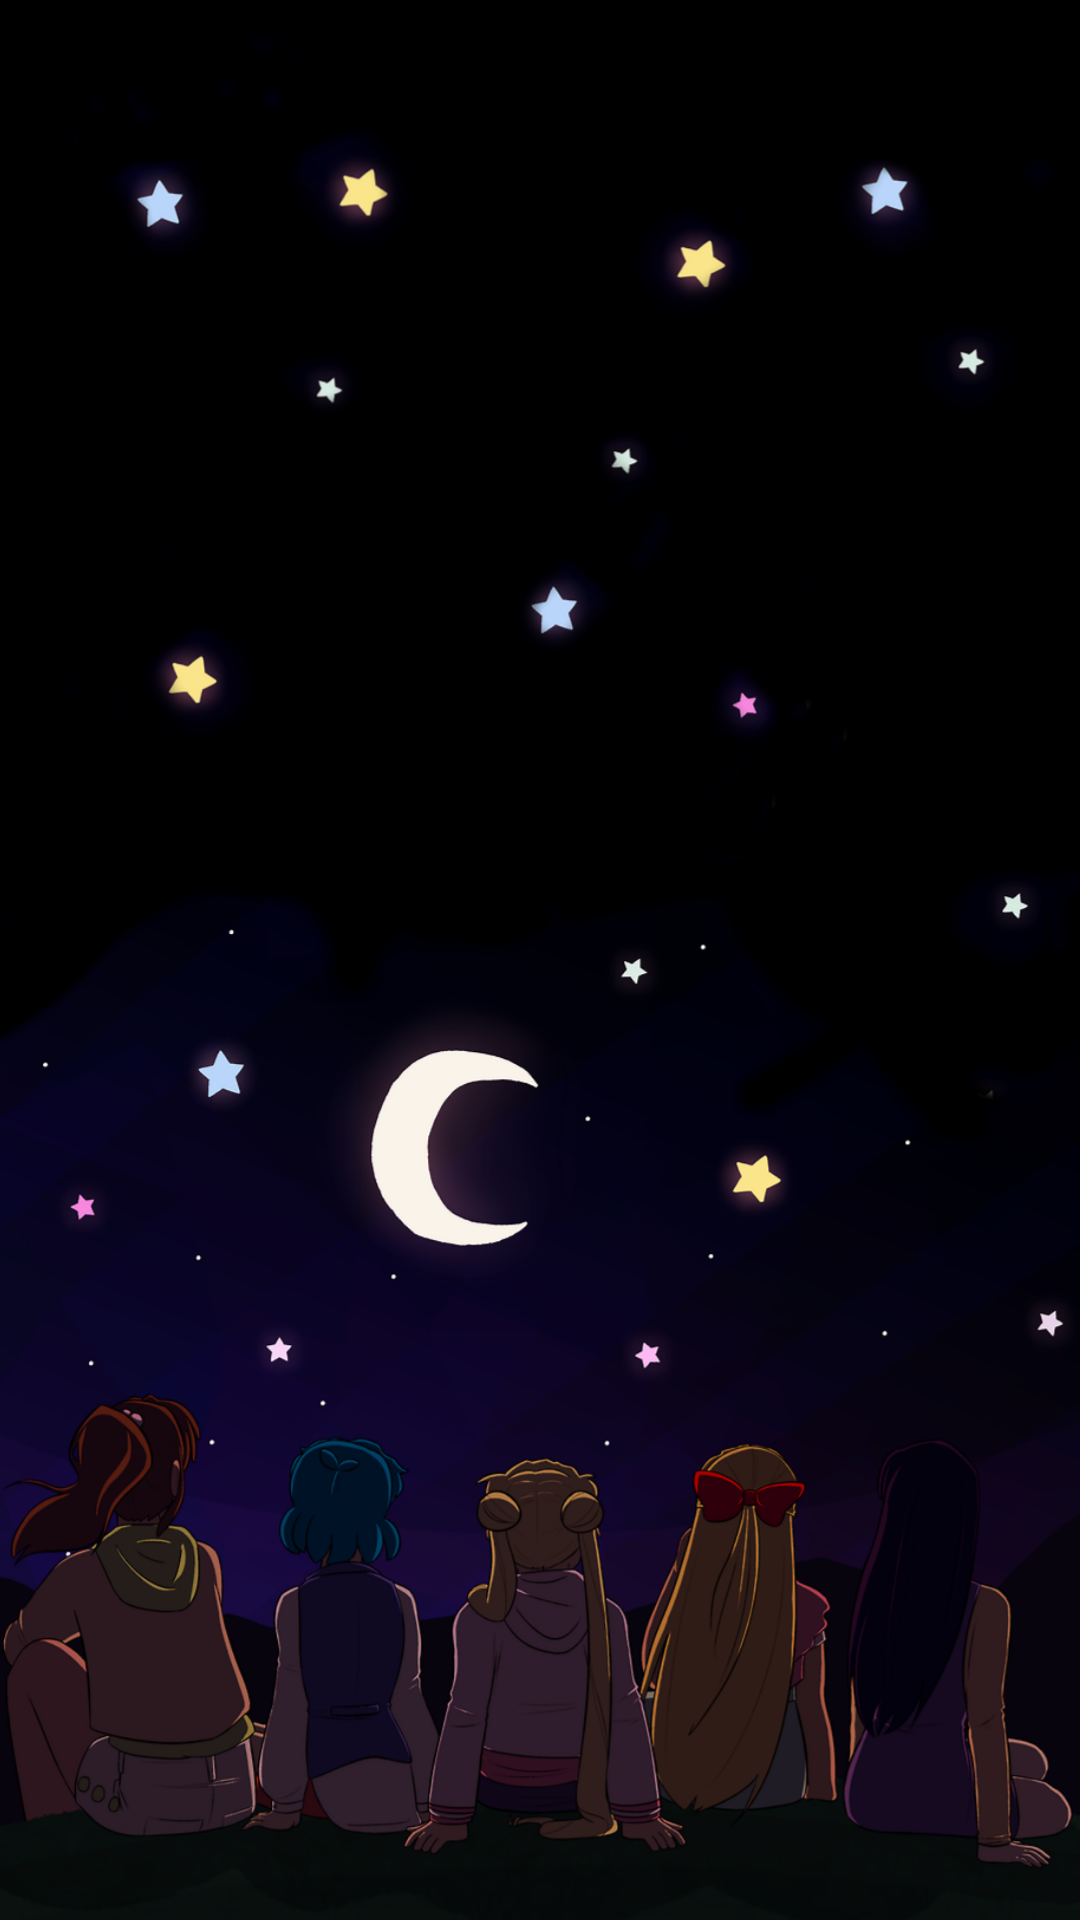 Pin By Tu Mara Moore On Sailor Moon Wallpaper Sailor Moon Wallpaper Anime Backgrounds Wallpapers Sailor Moon Fan Art